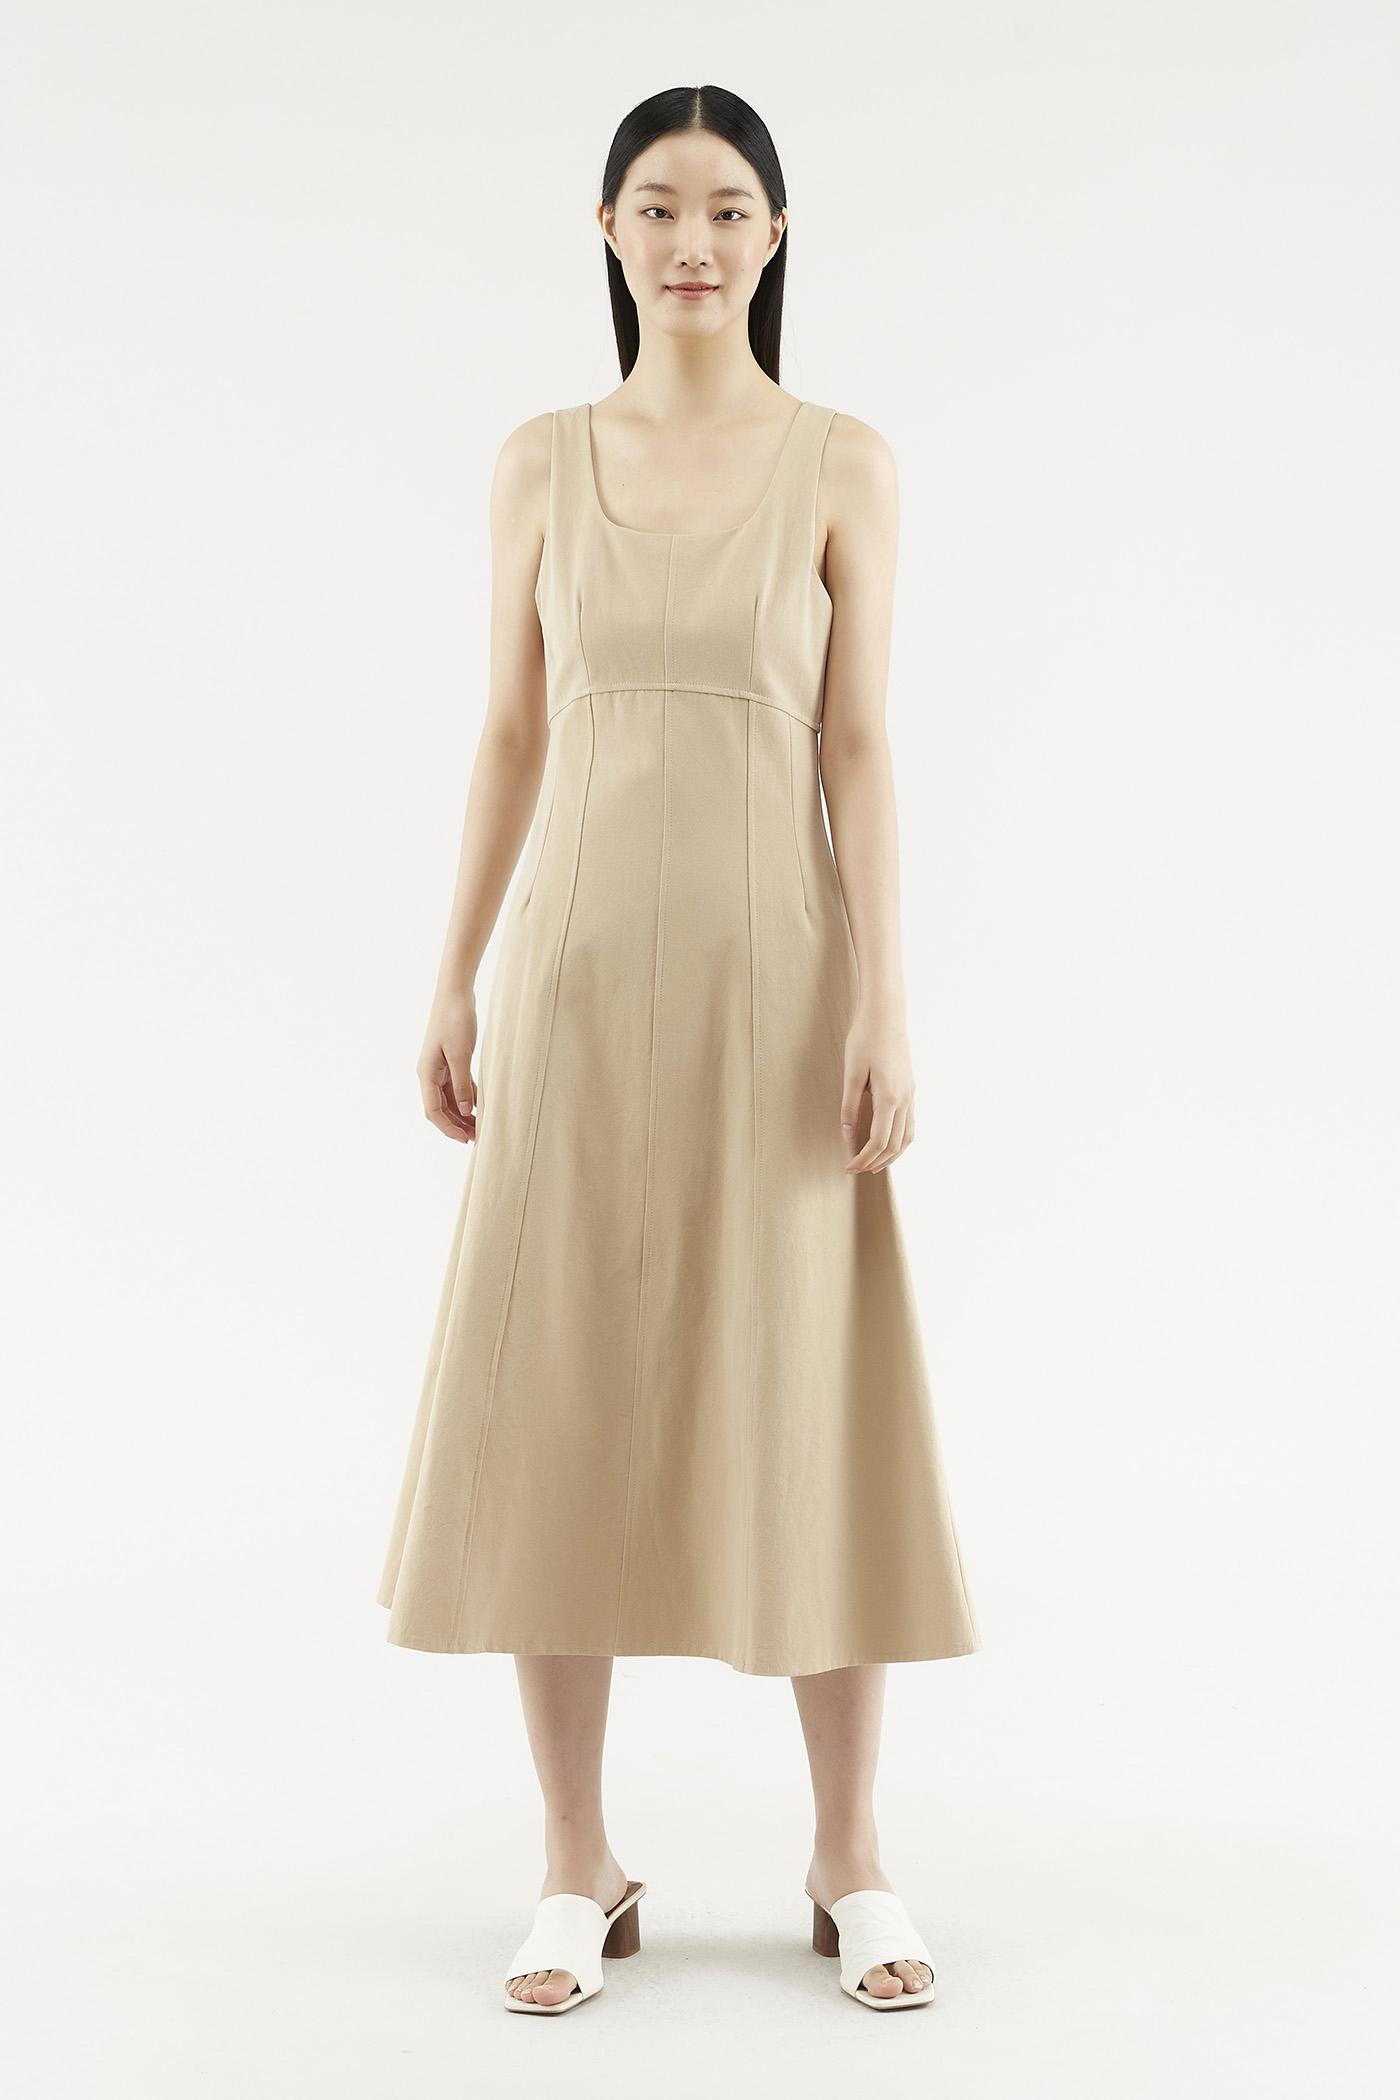 Tamesha Panelled Dress